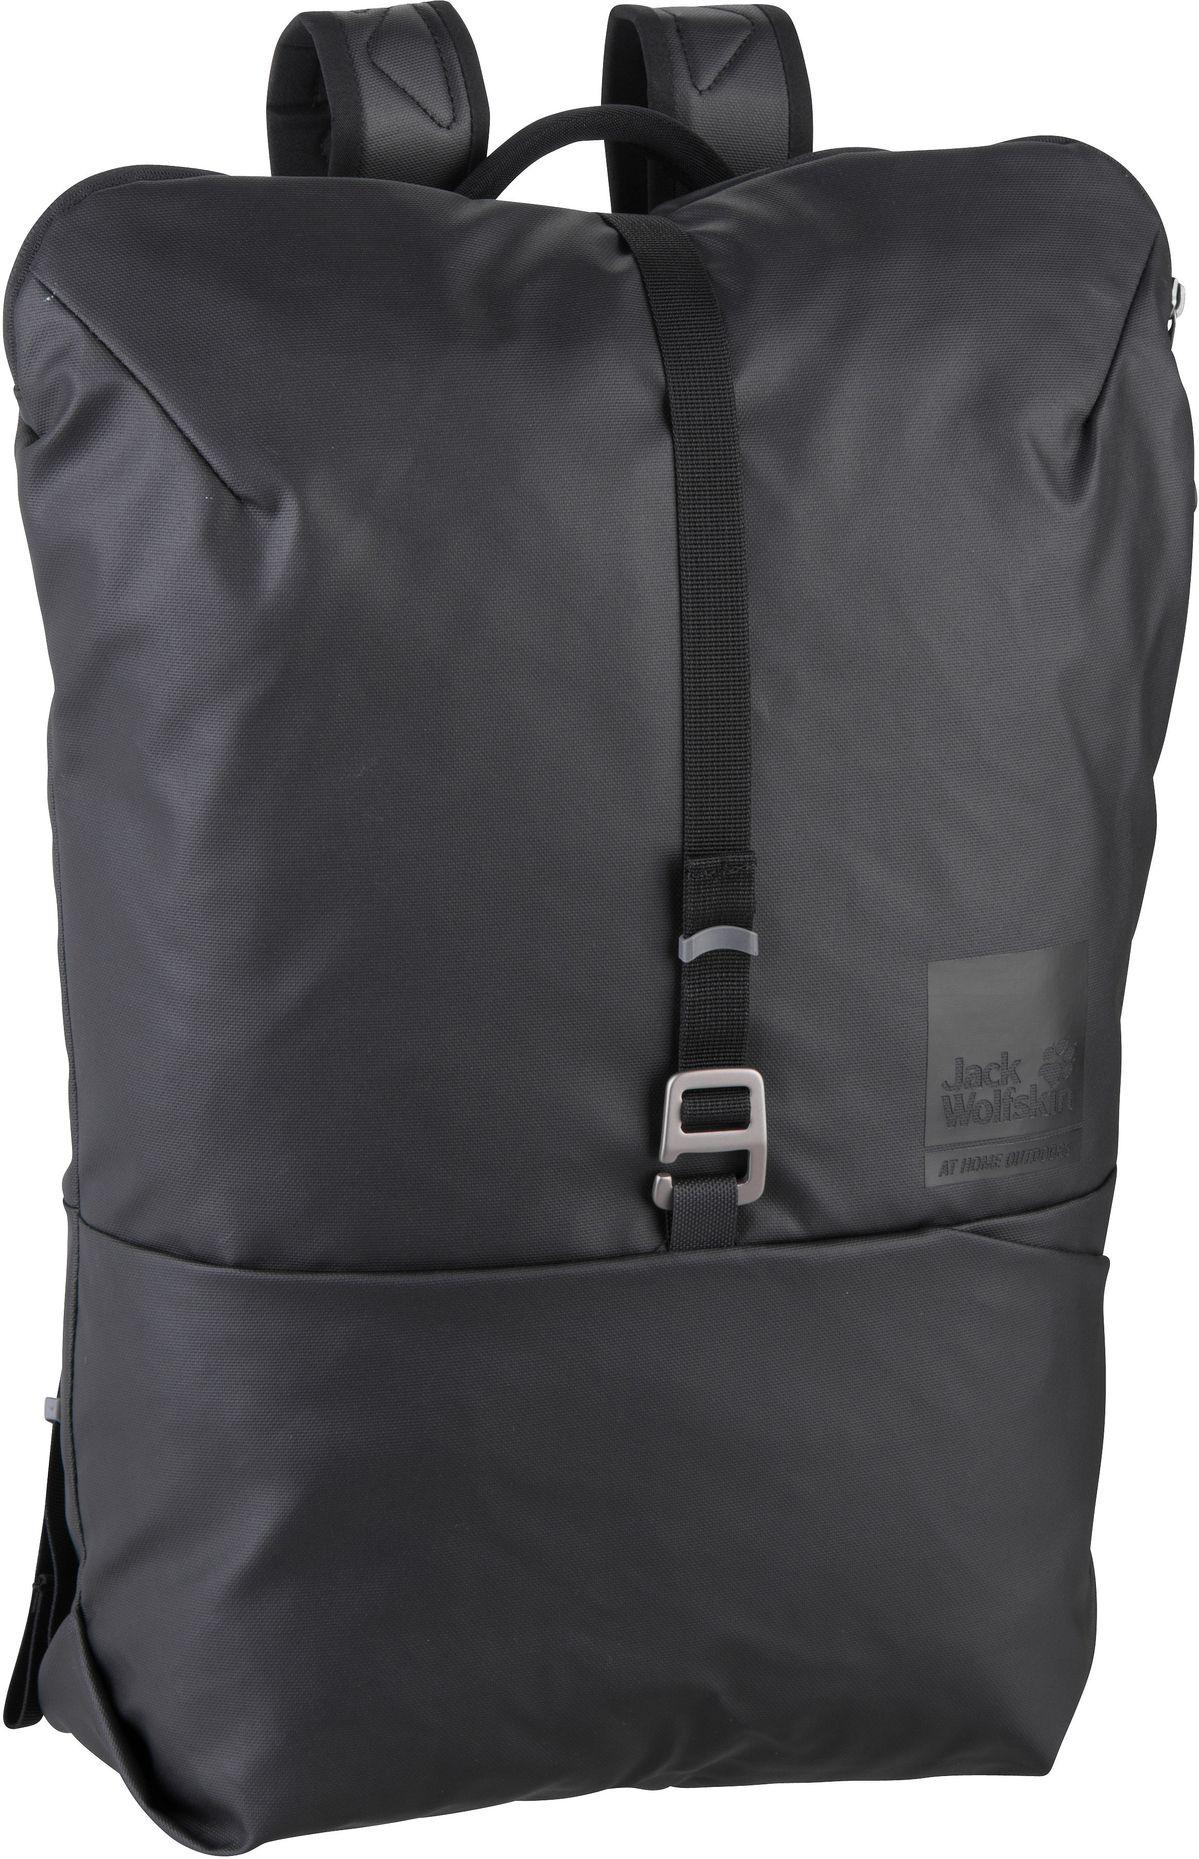 Rucksack / Daypack 365 OnTheMove 24 Pack Black (24 Liter)